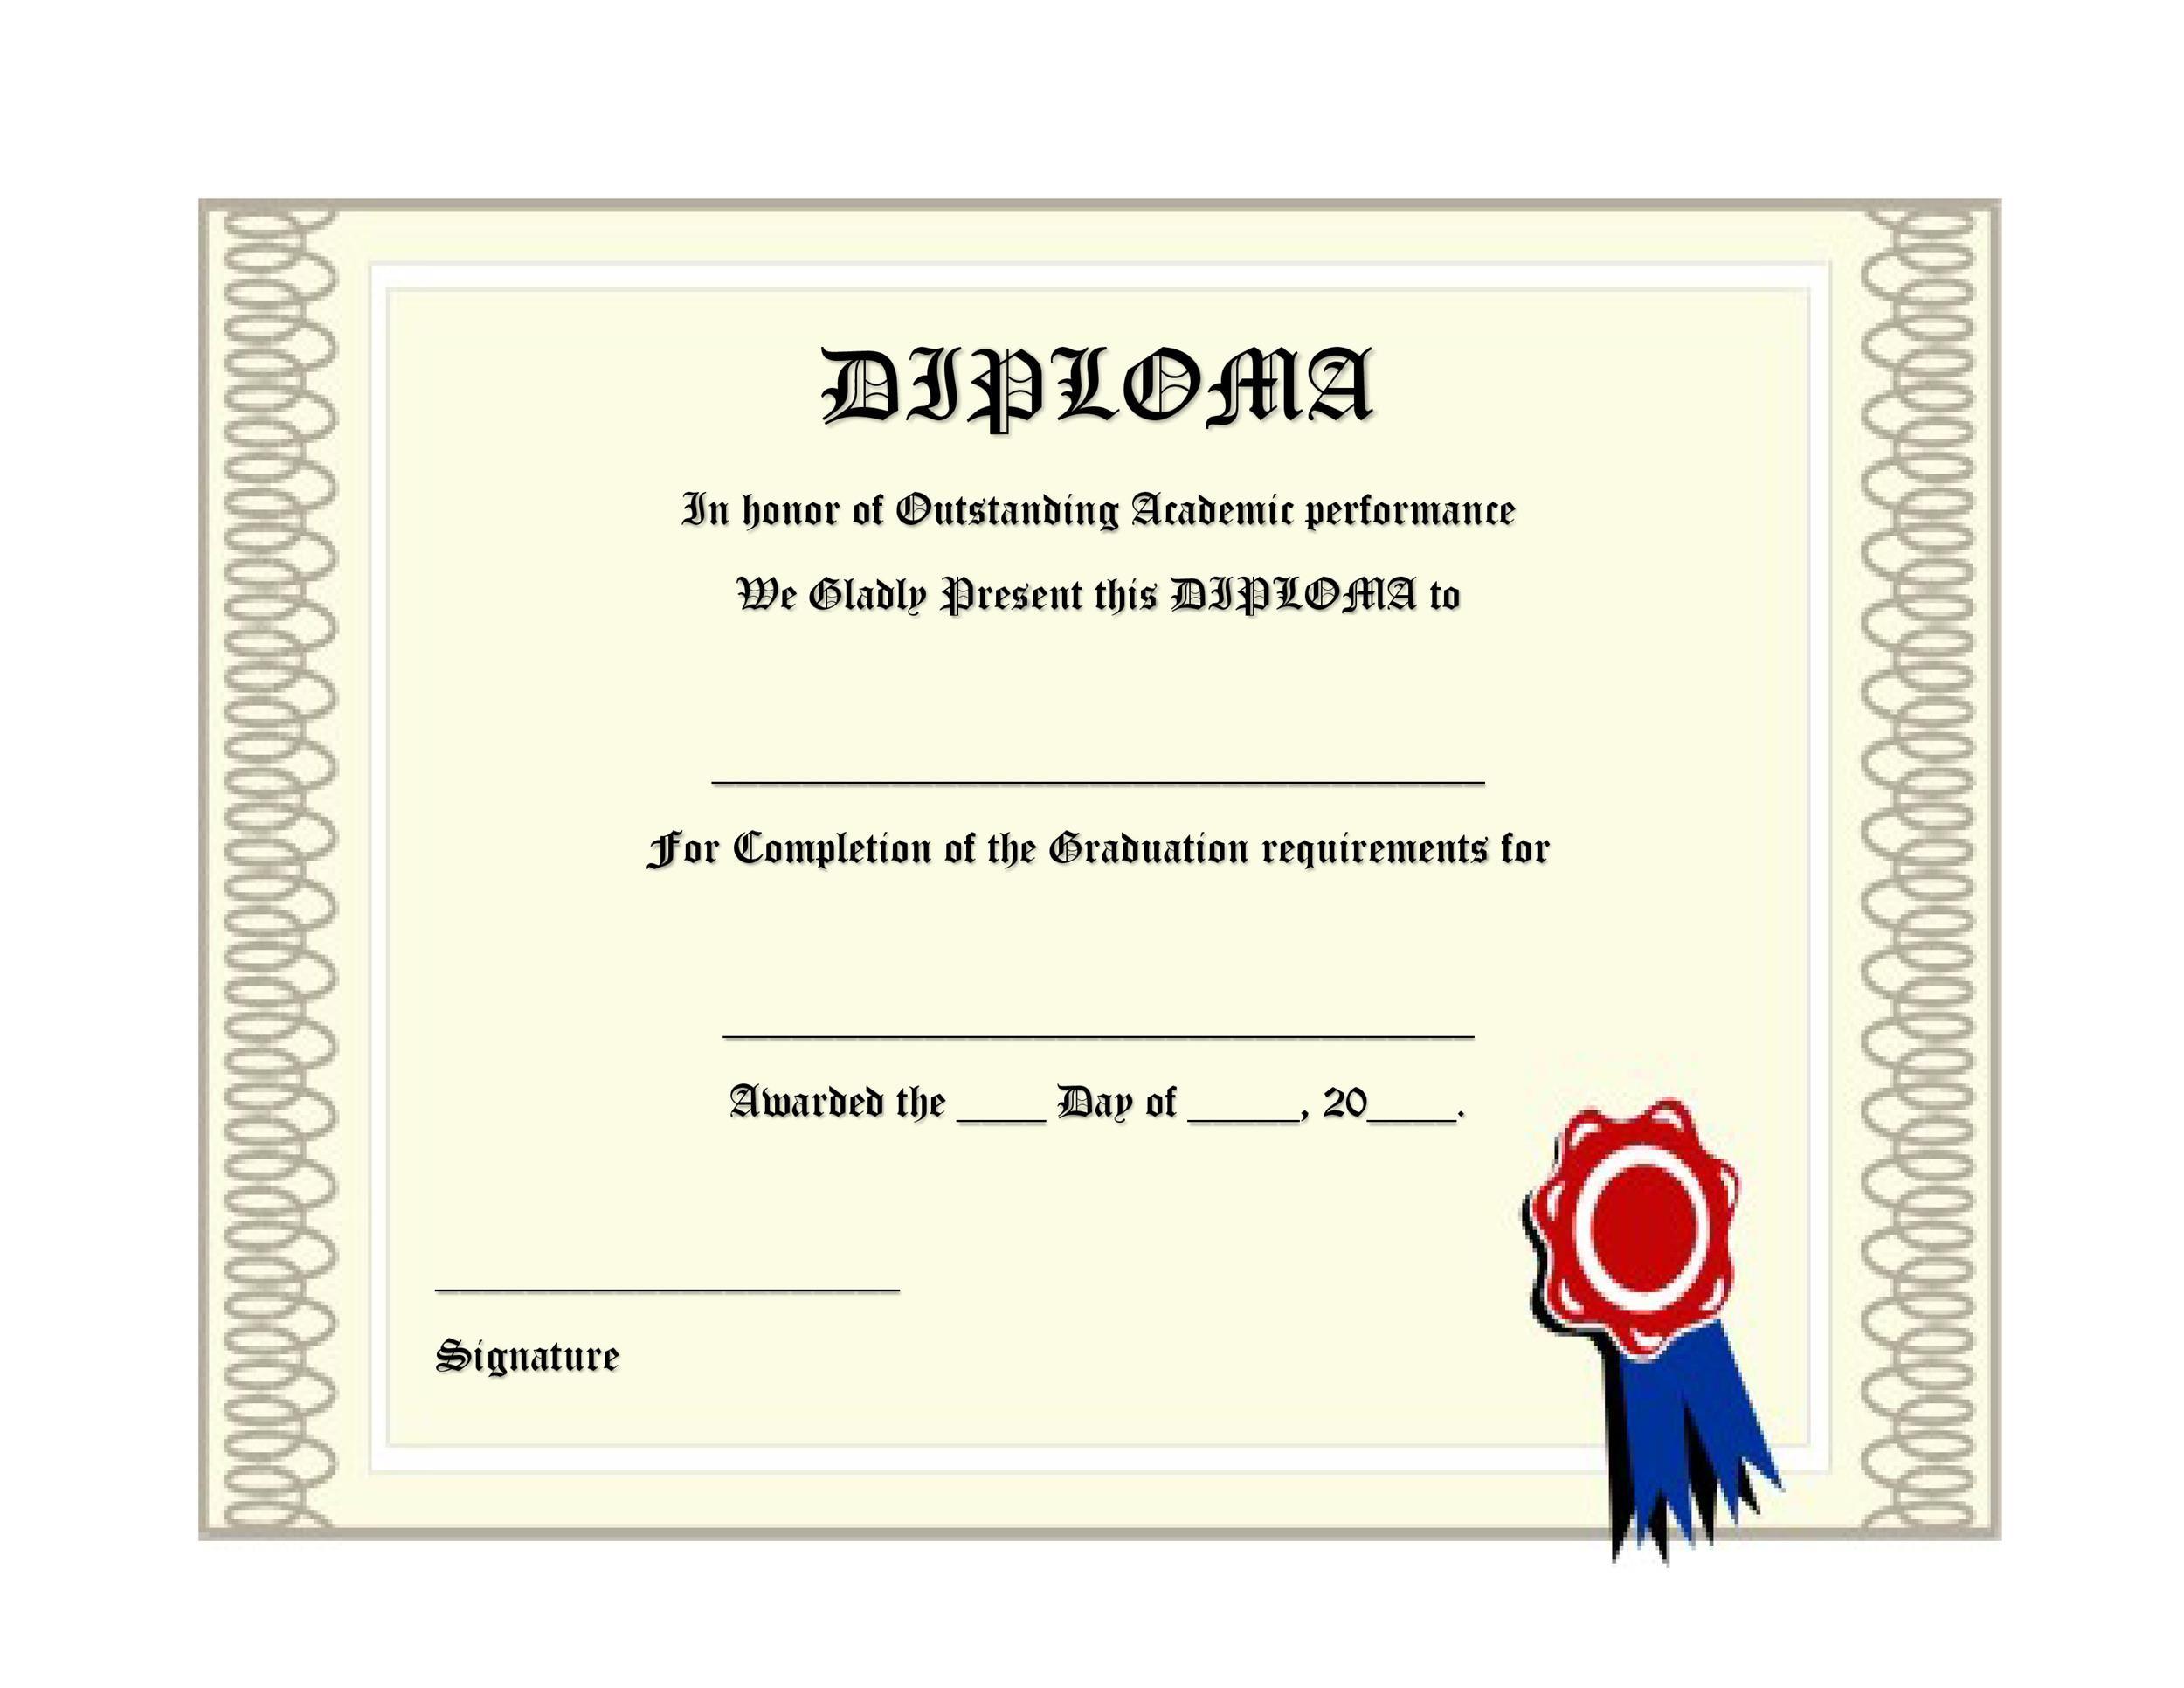 Fake High School Diploma Template New Diploma On High School - blank high school diploma